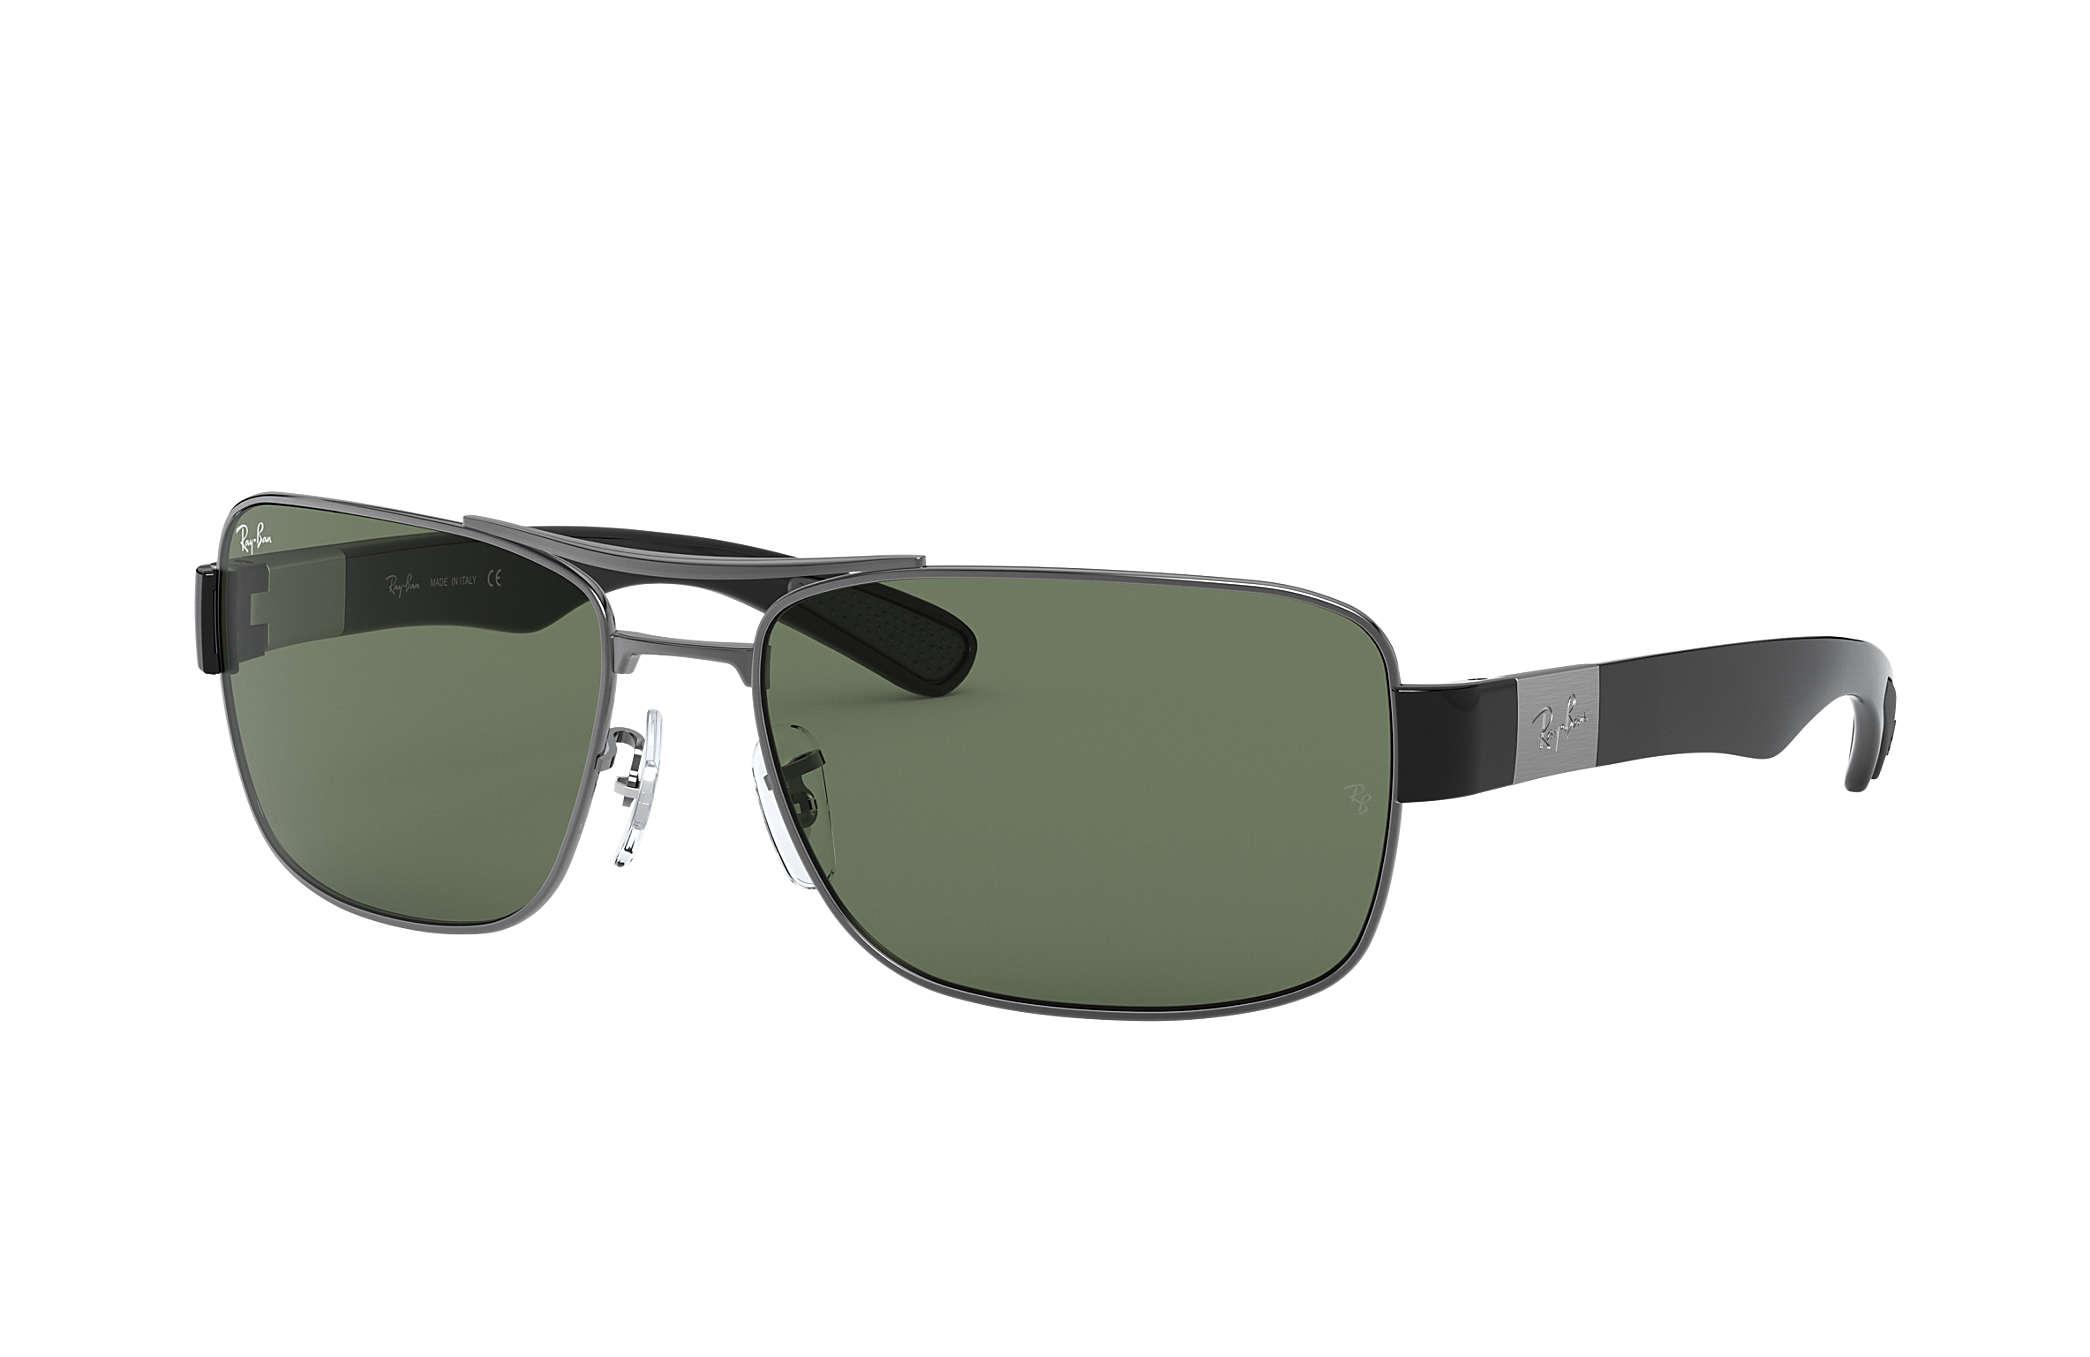 dd9e6a1183 Ray-Ban RB3522 Gunmetal - Metal - Green Lenses - 0RB3522004 7161 ...